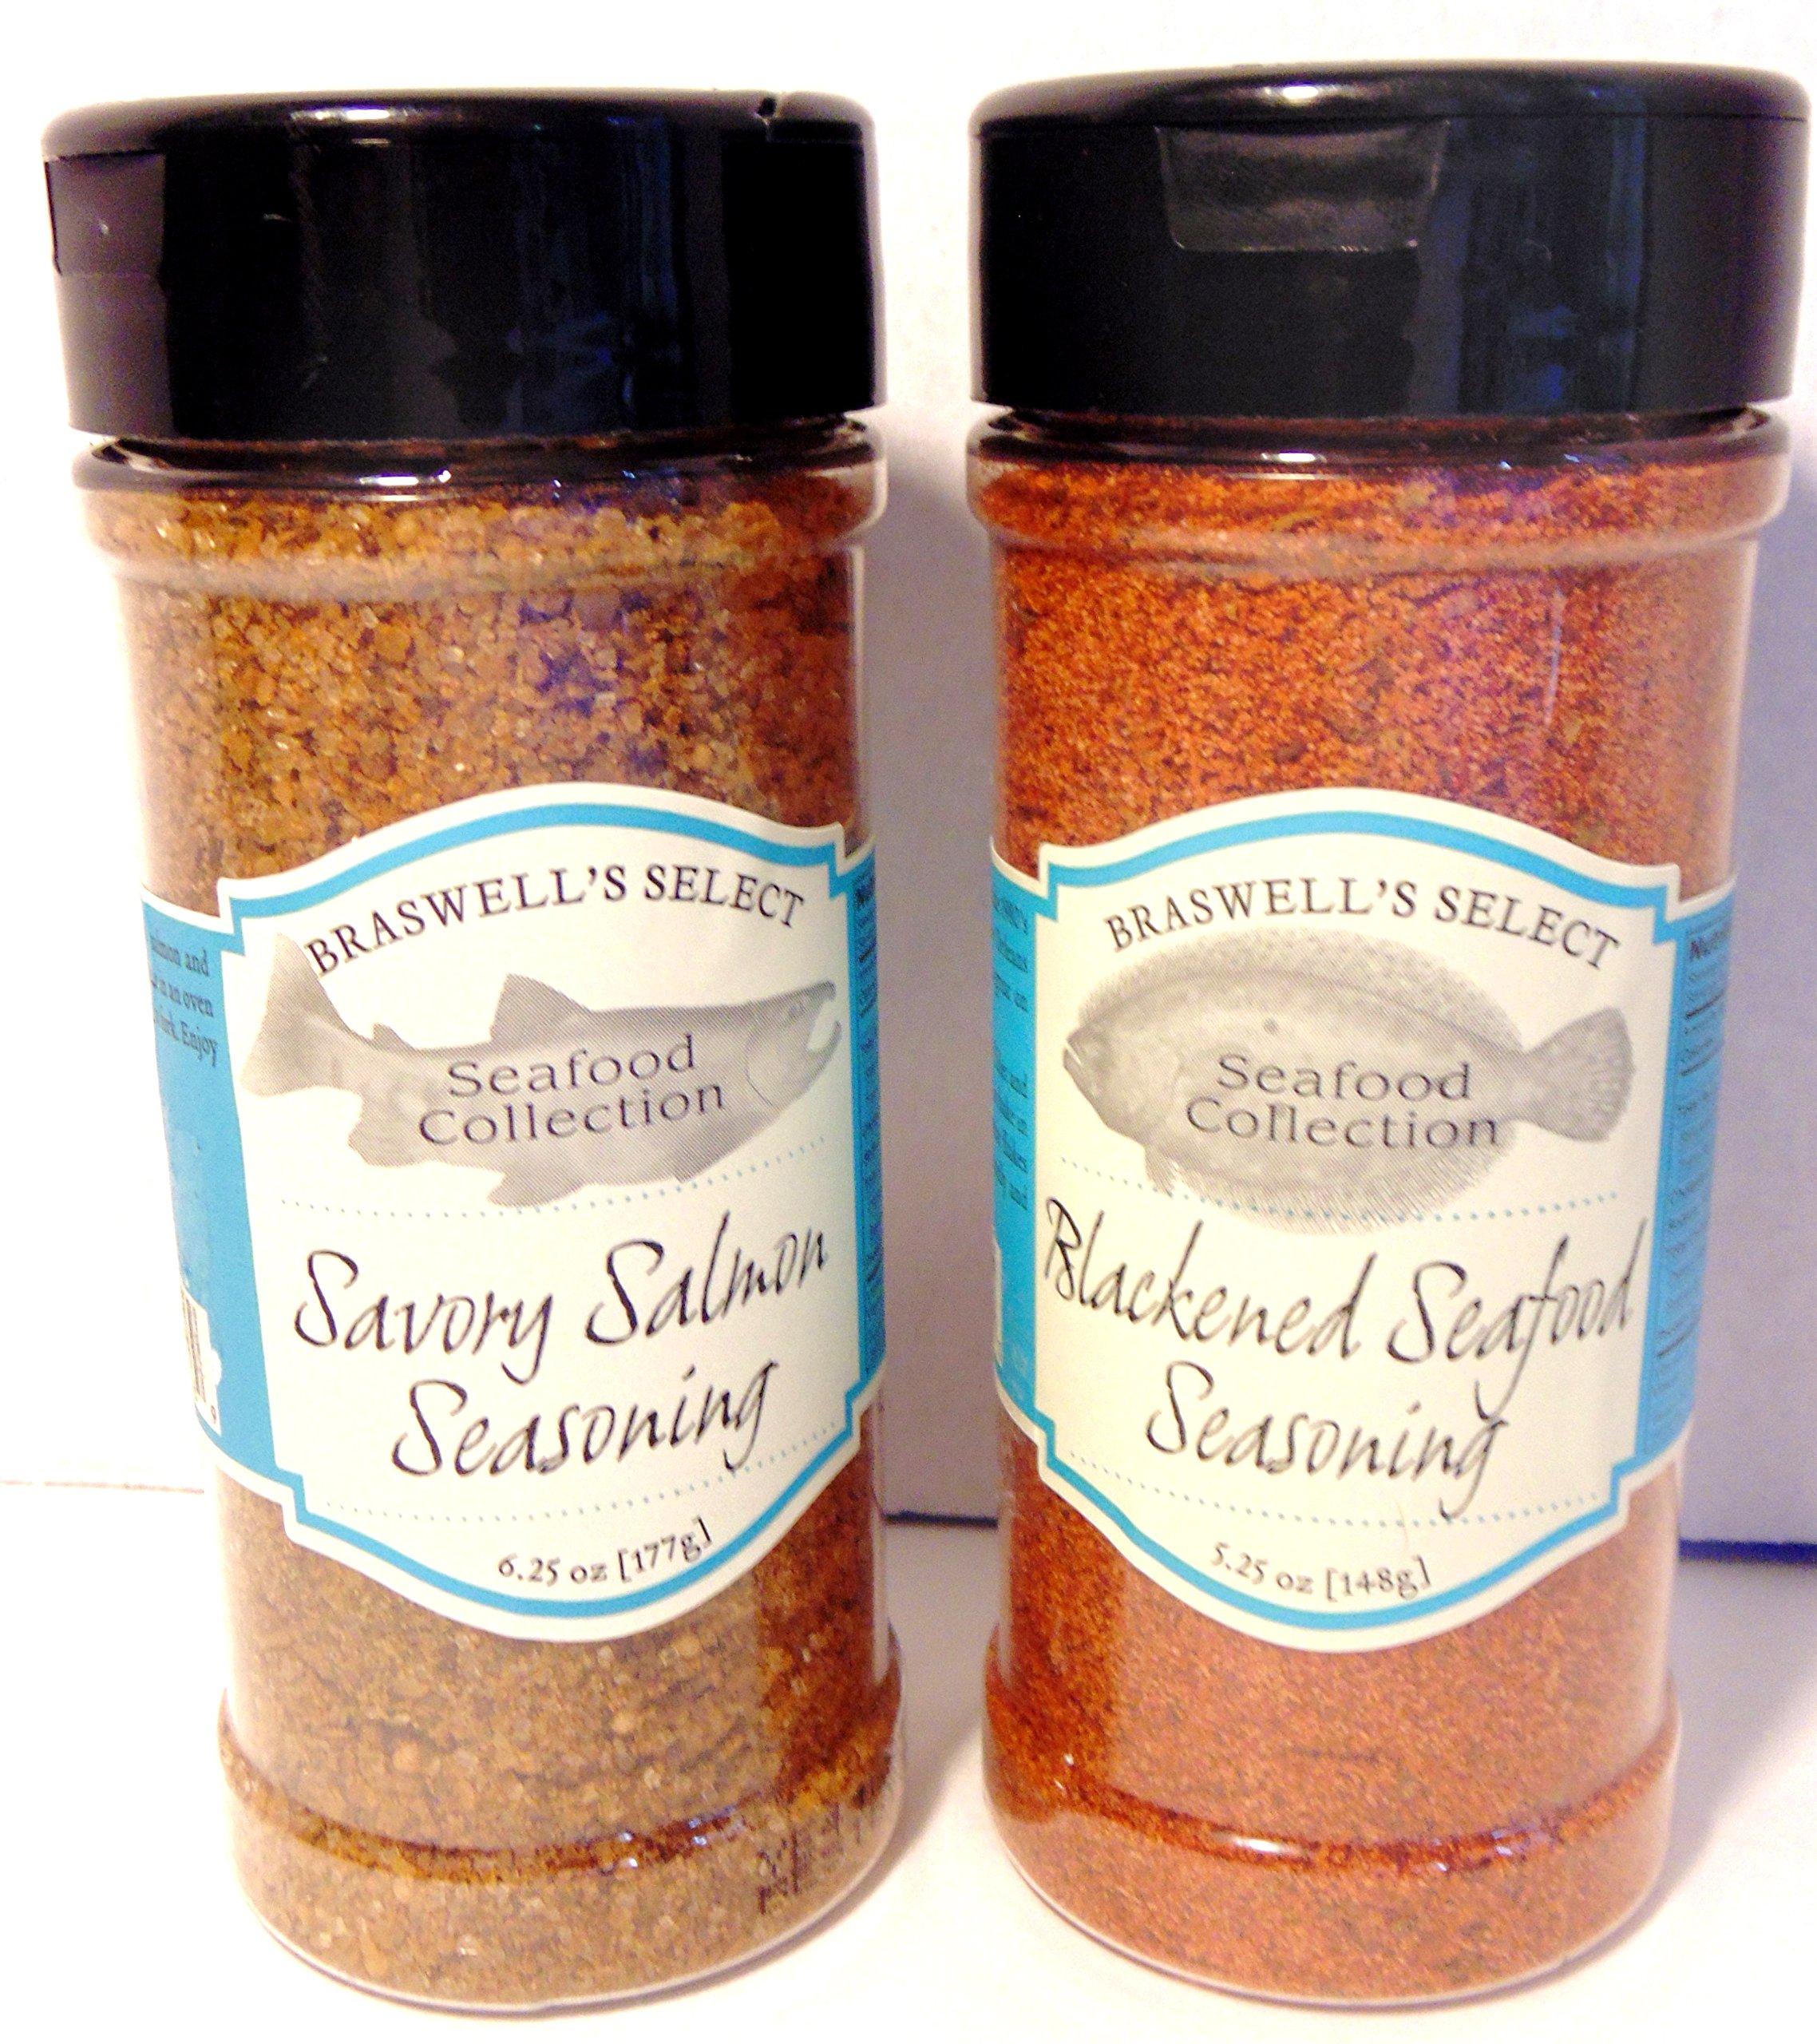 Braswell's Select Seafood Collection Spice (Set of 2) Bundle Includes: Blackend Seafood Seasoning 5.25oz & Savory Salmon Seasoning 6.25oz